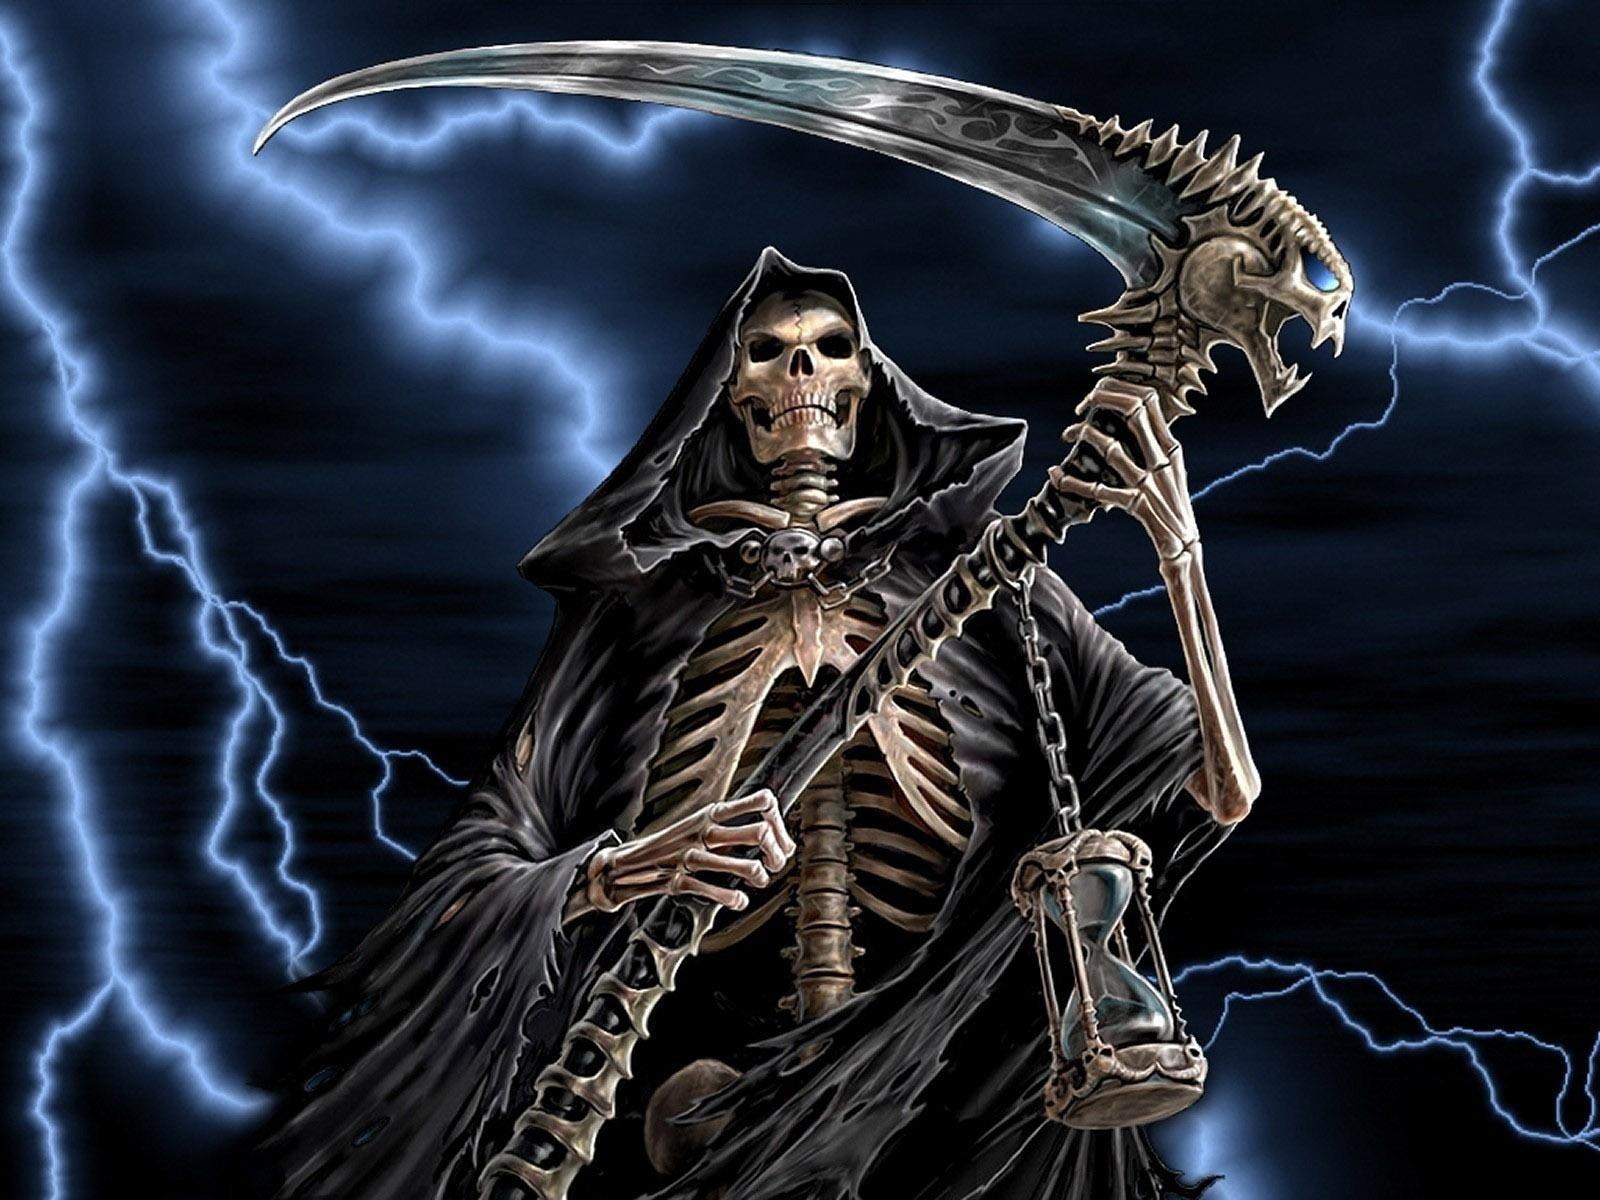 Hd Wallpaper - Grim Reaper , HD Wallpaper & Backgrounds